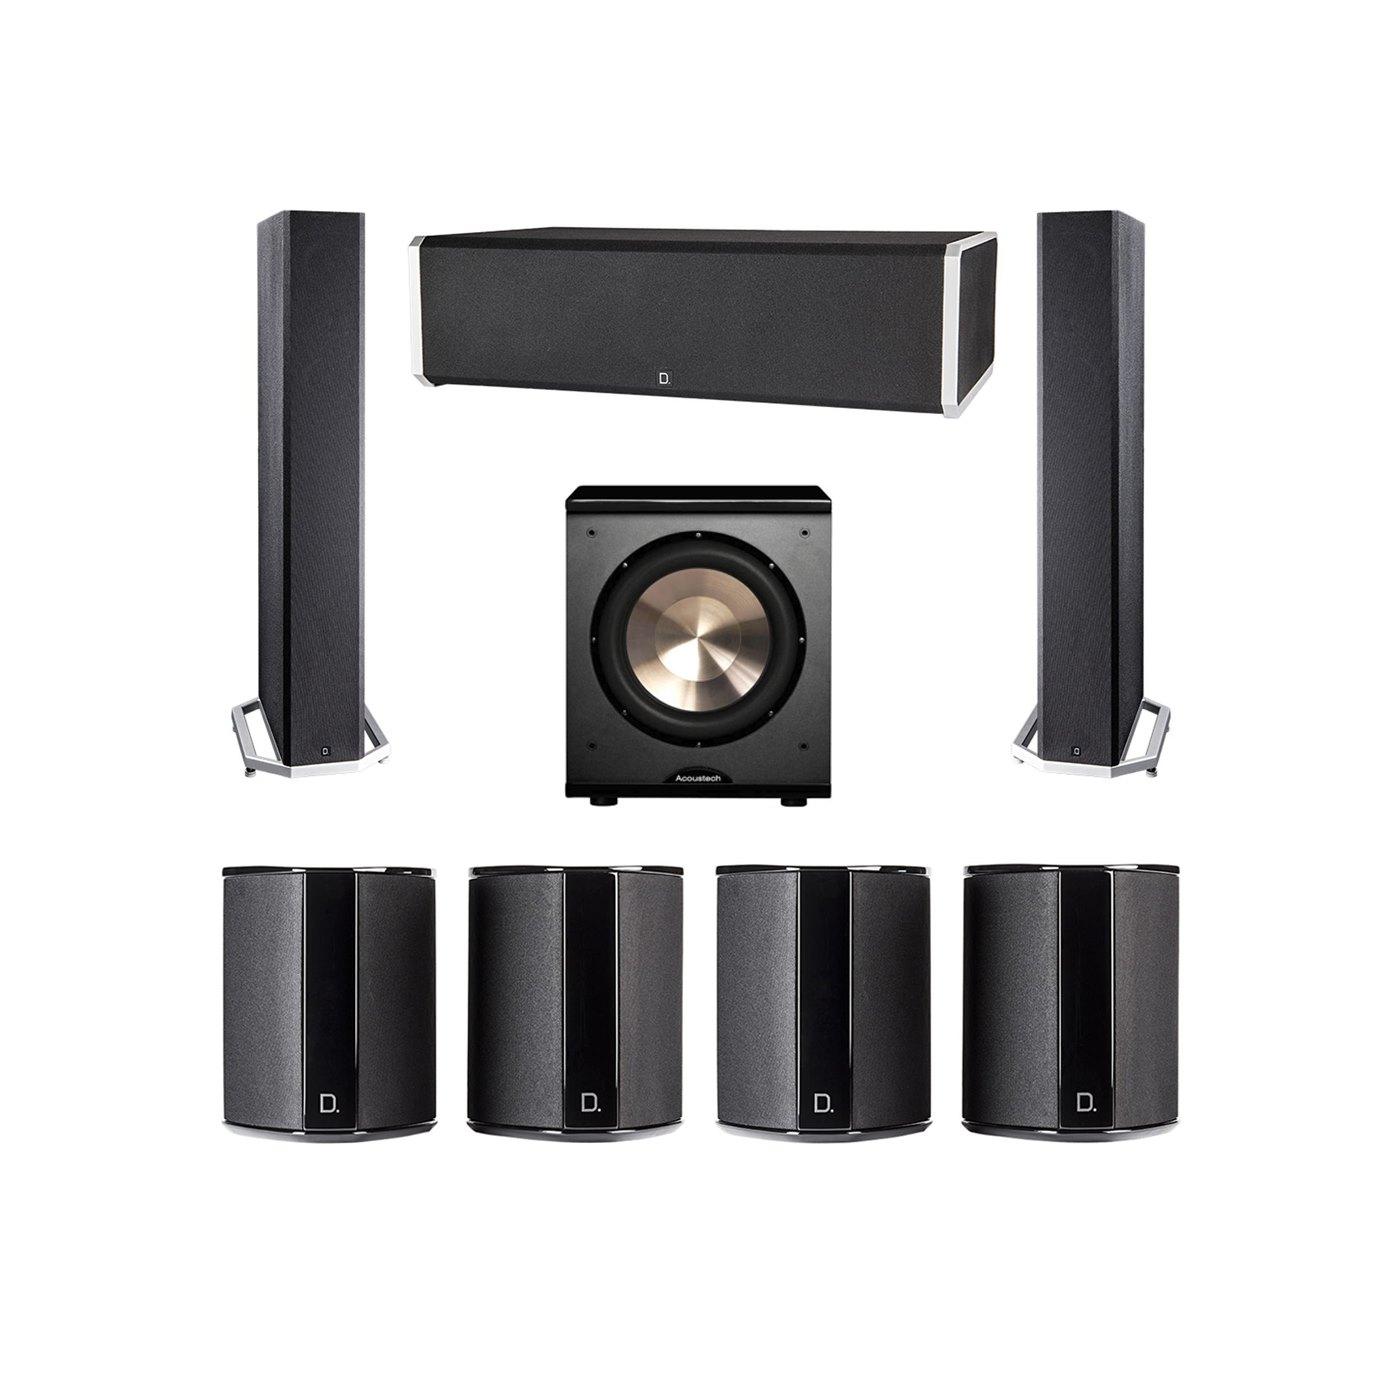 Definitive Technology 7.1 System with 2 BP9040 Tower Speakers, 1 CS9060 Center Channel Speaker, 4 SR9040 Surround Speaker, 1 BIC PL-200 Subwoofer